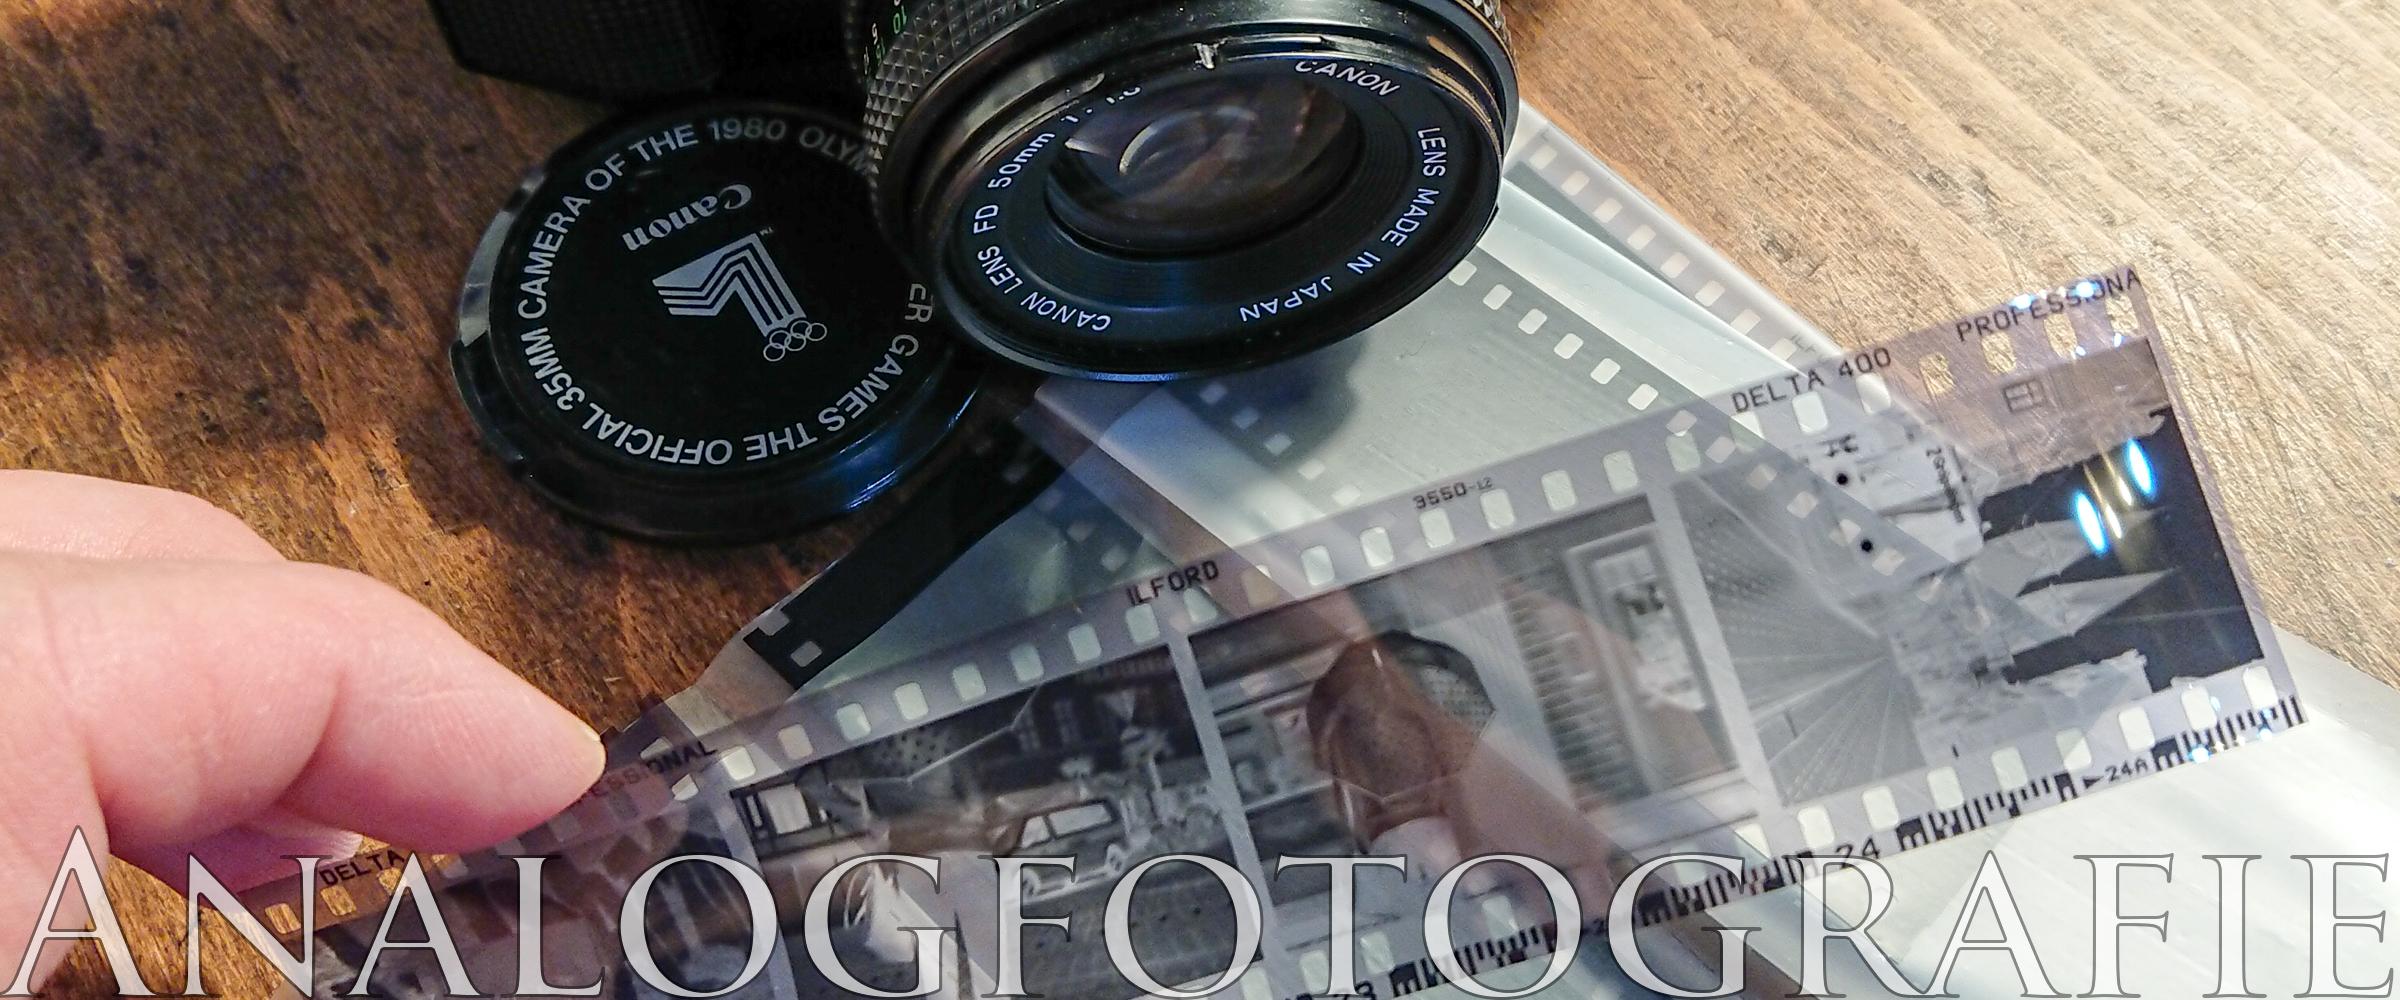 Analogfotografie, Fotokurs, Bremen, Analoge, Fotografie, Fotoschule